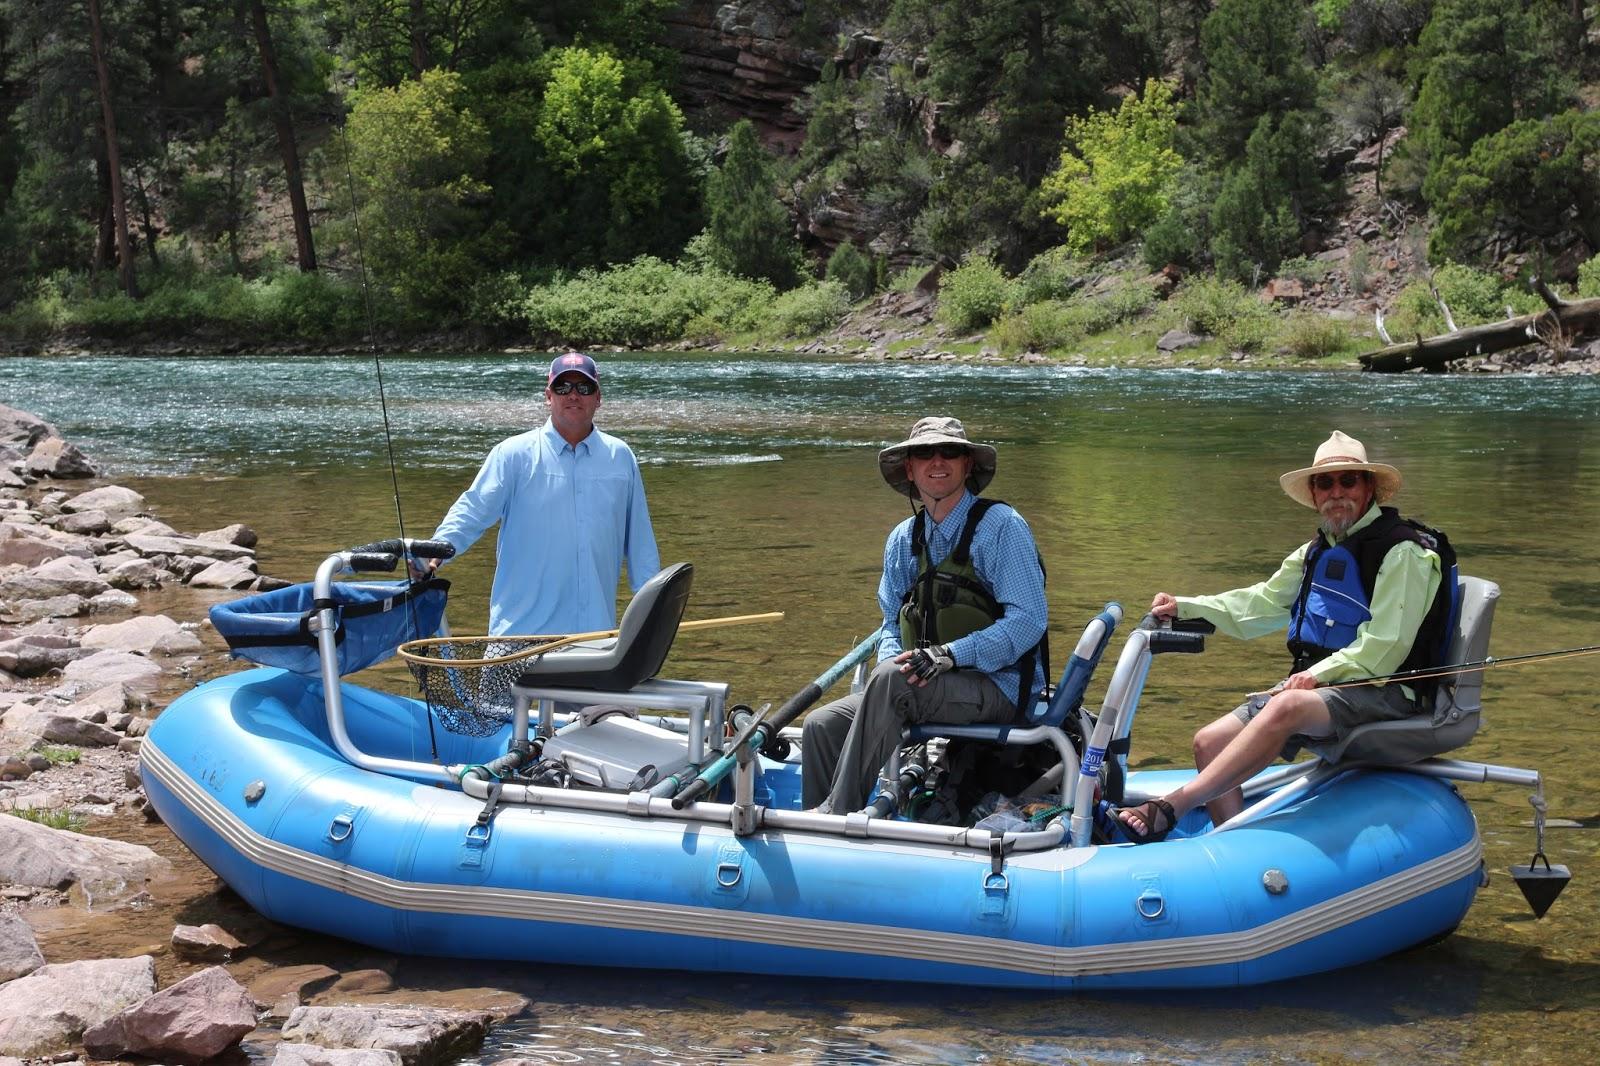 Jay scott outdoors green river fishing trip june 2015 for Green river fishing